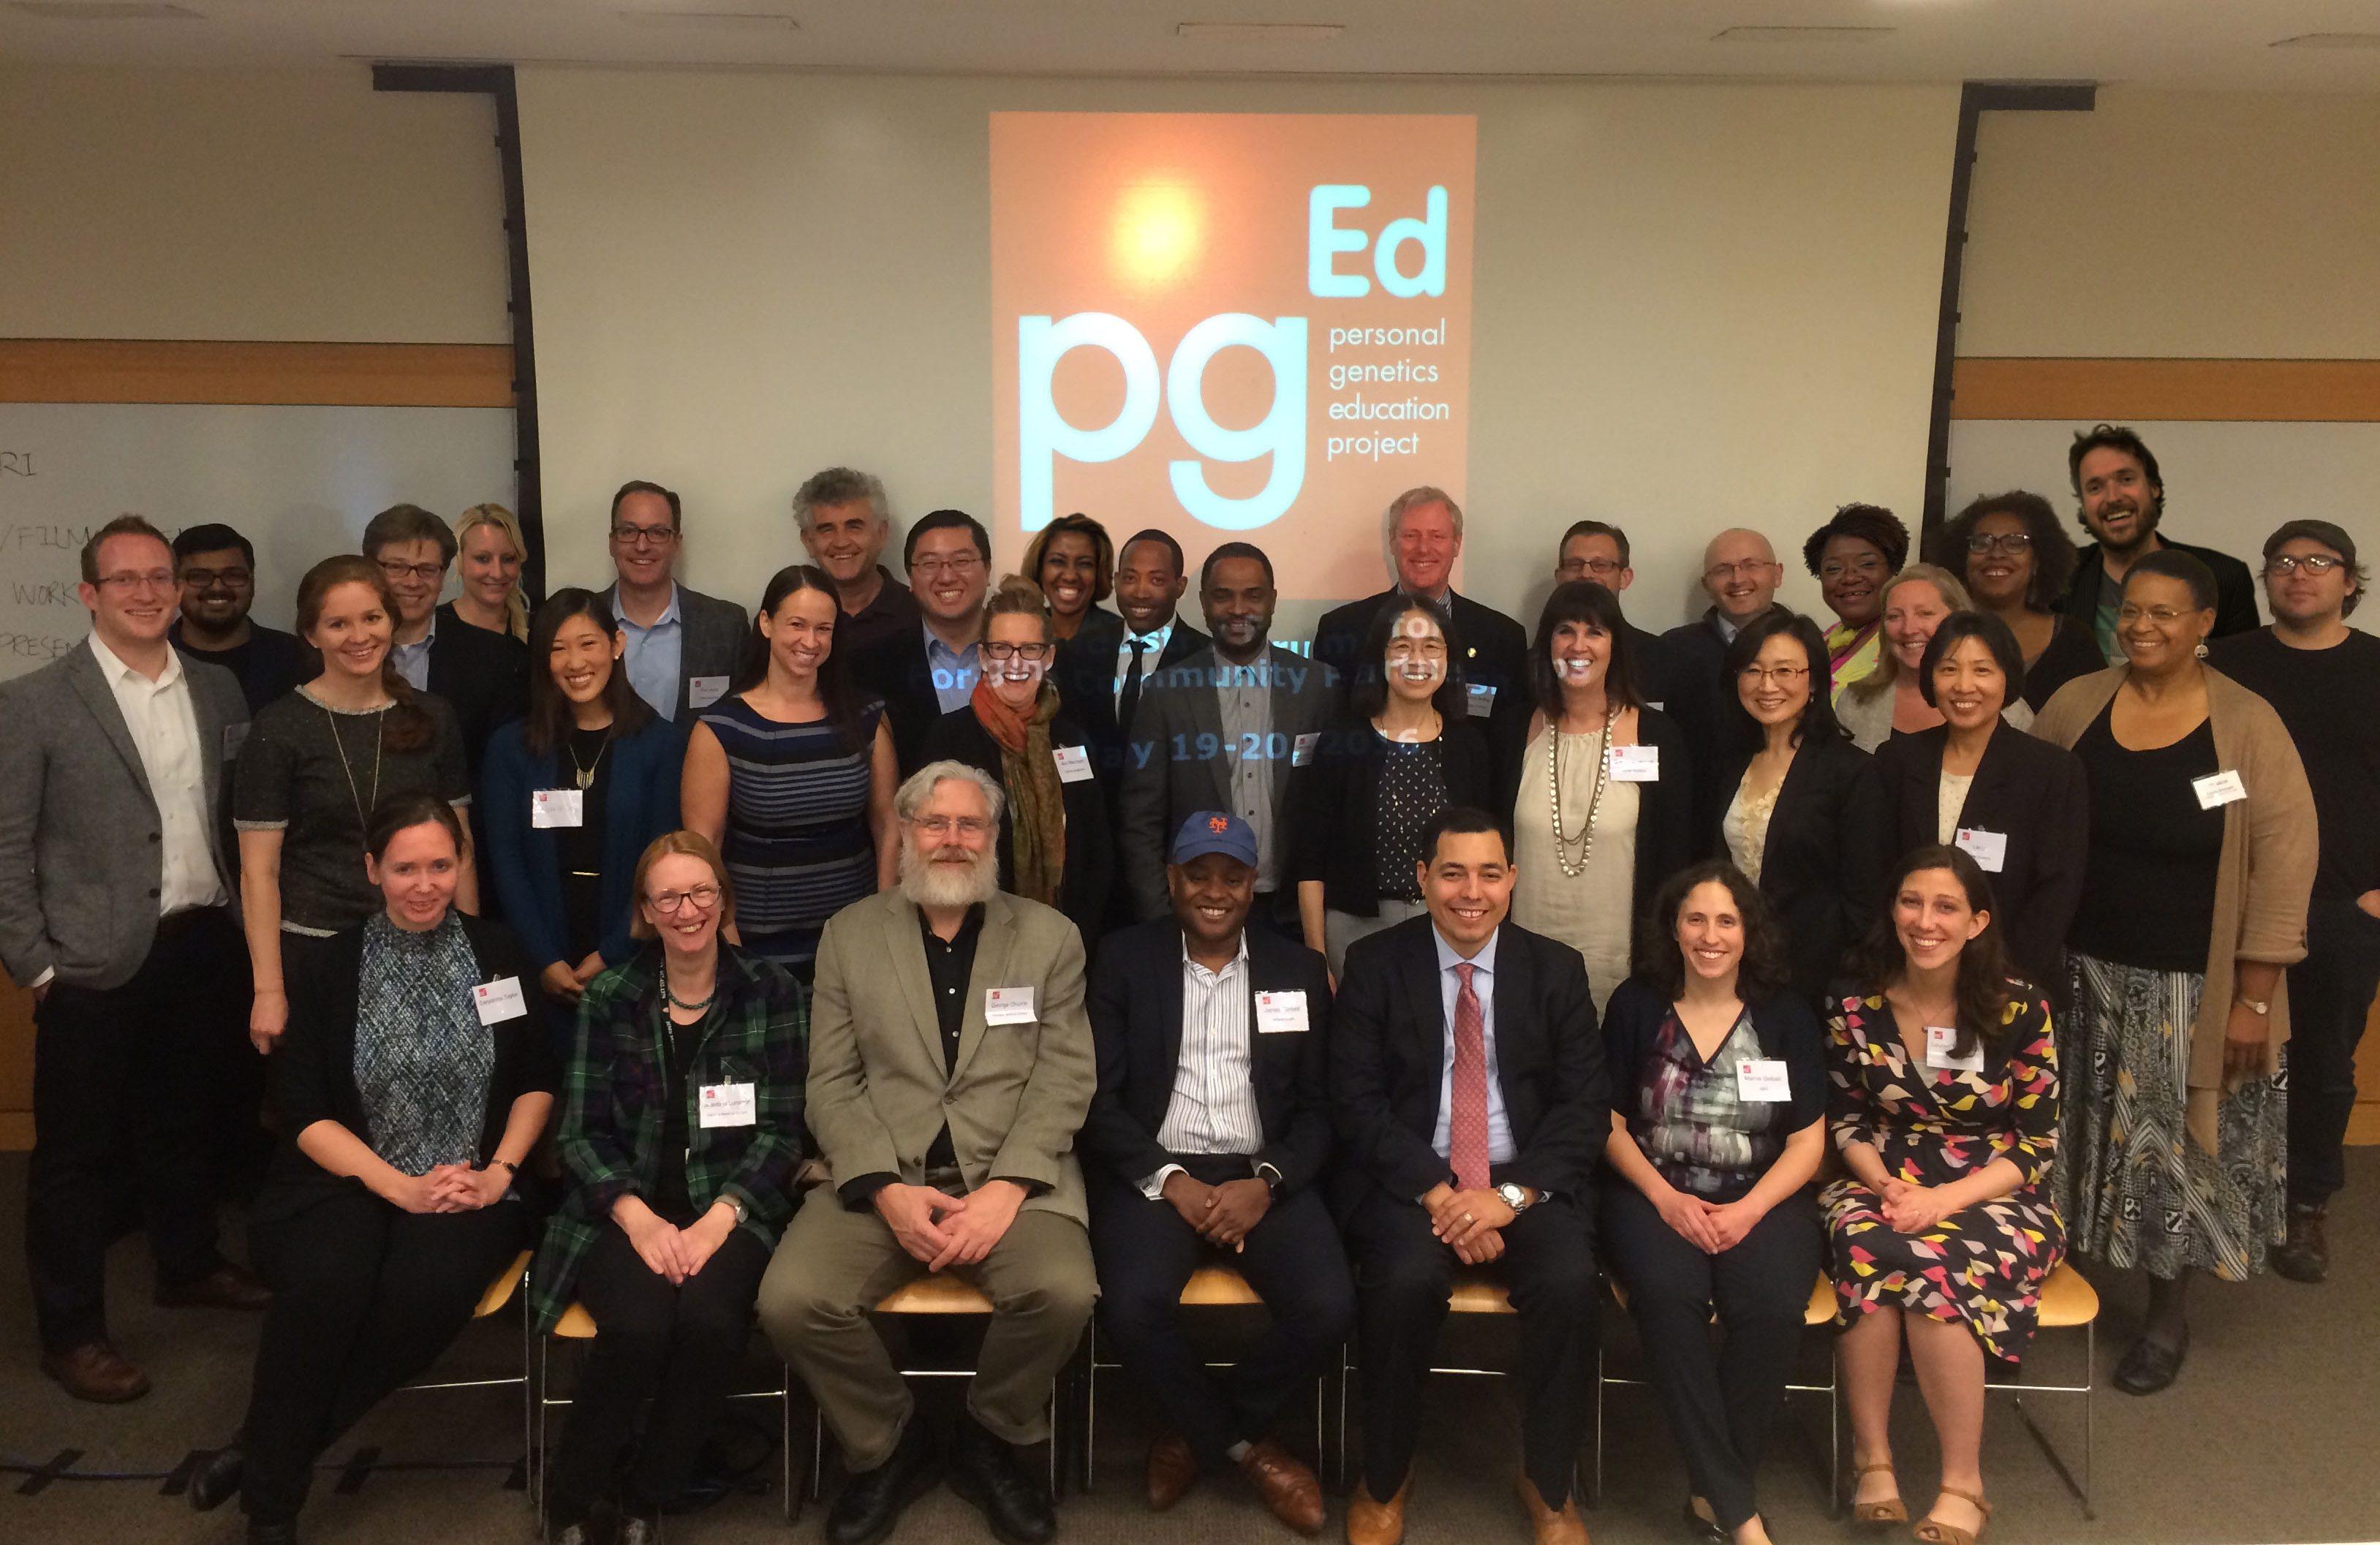 Industry Forum for Forging Community Partnerships, Boston, MA